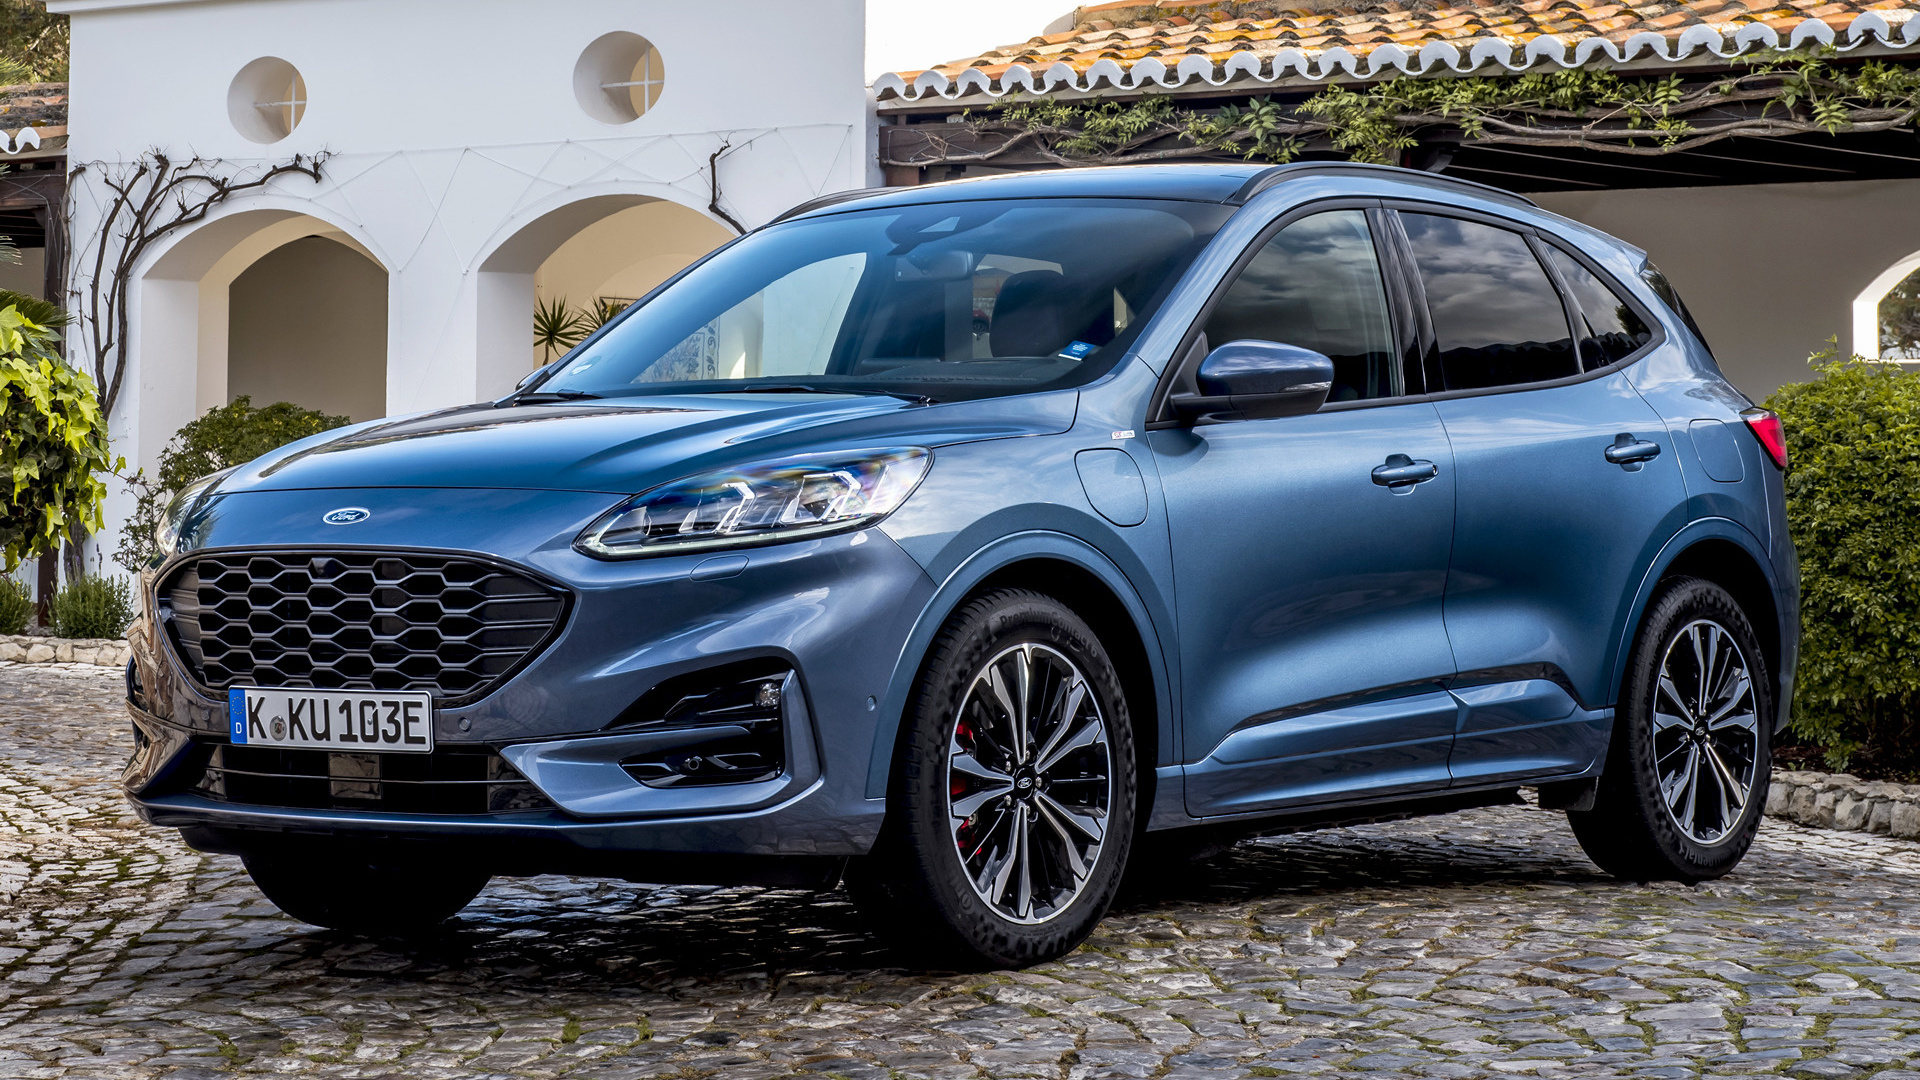 2020 Ford Kuga Plug-In Hybrid ST-Line - Fondos de Pantalla ...